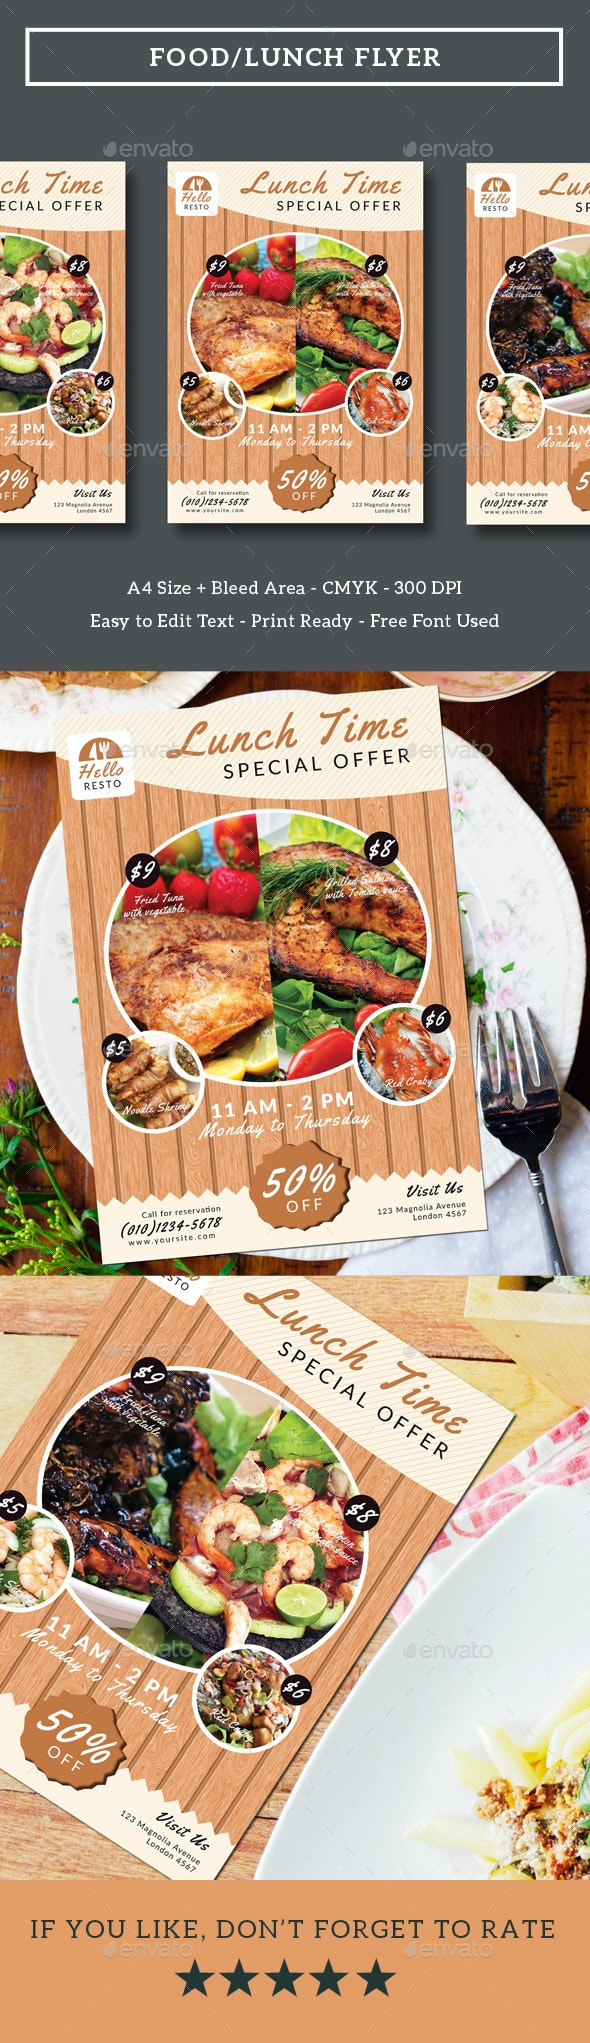 Food/Lunch Flyer - Restaurant Flyers